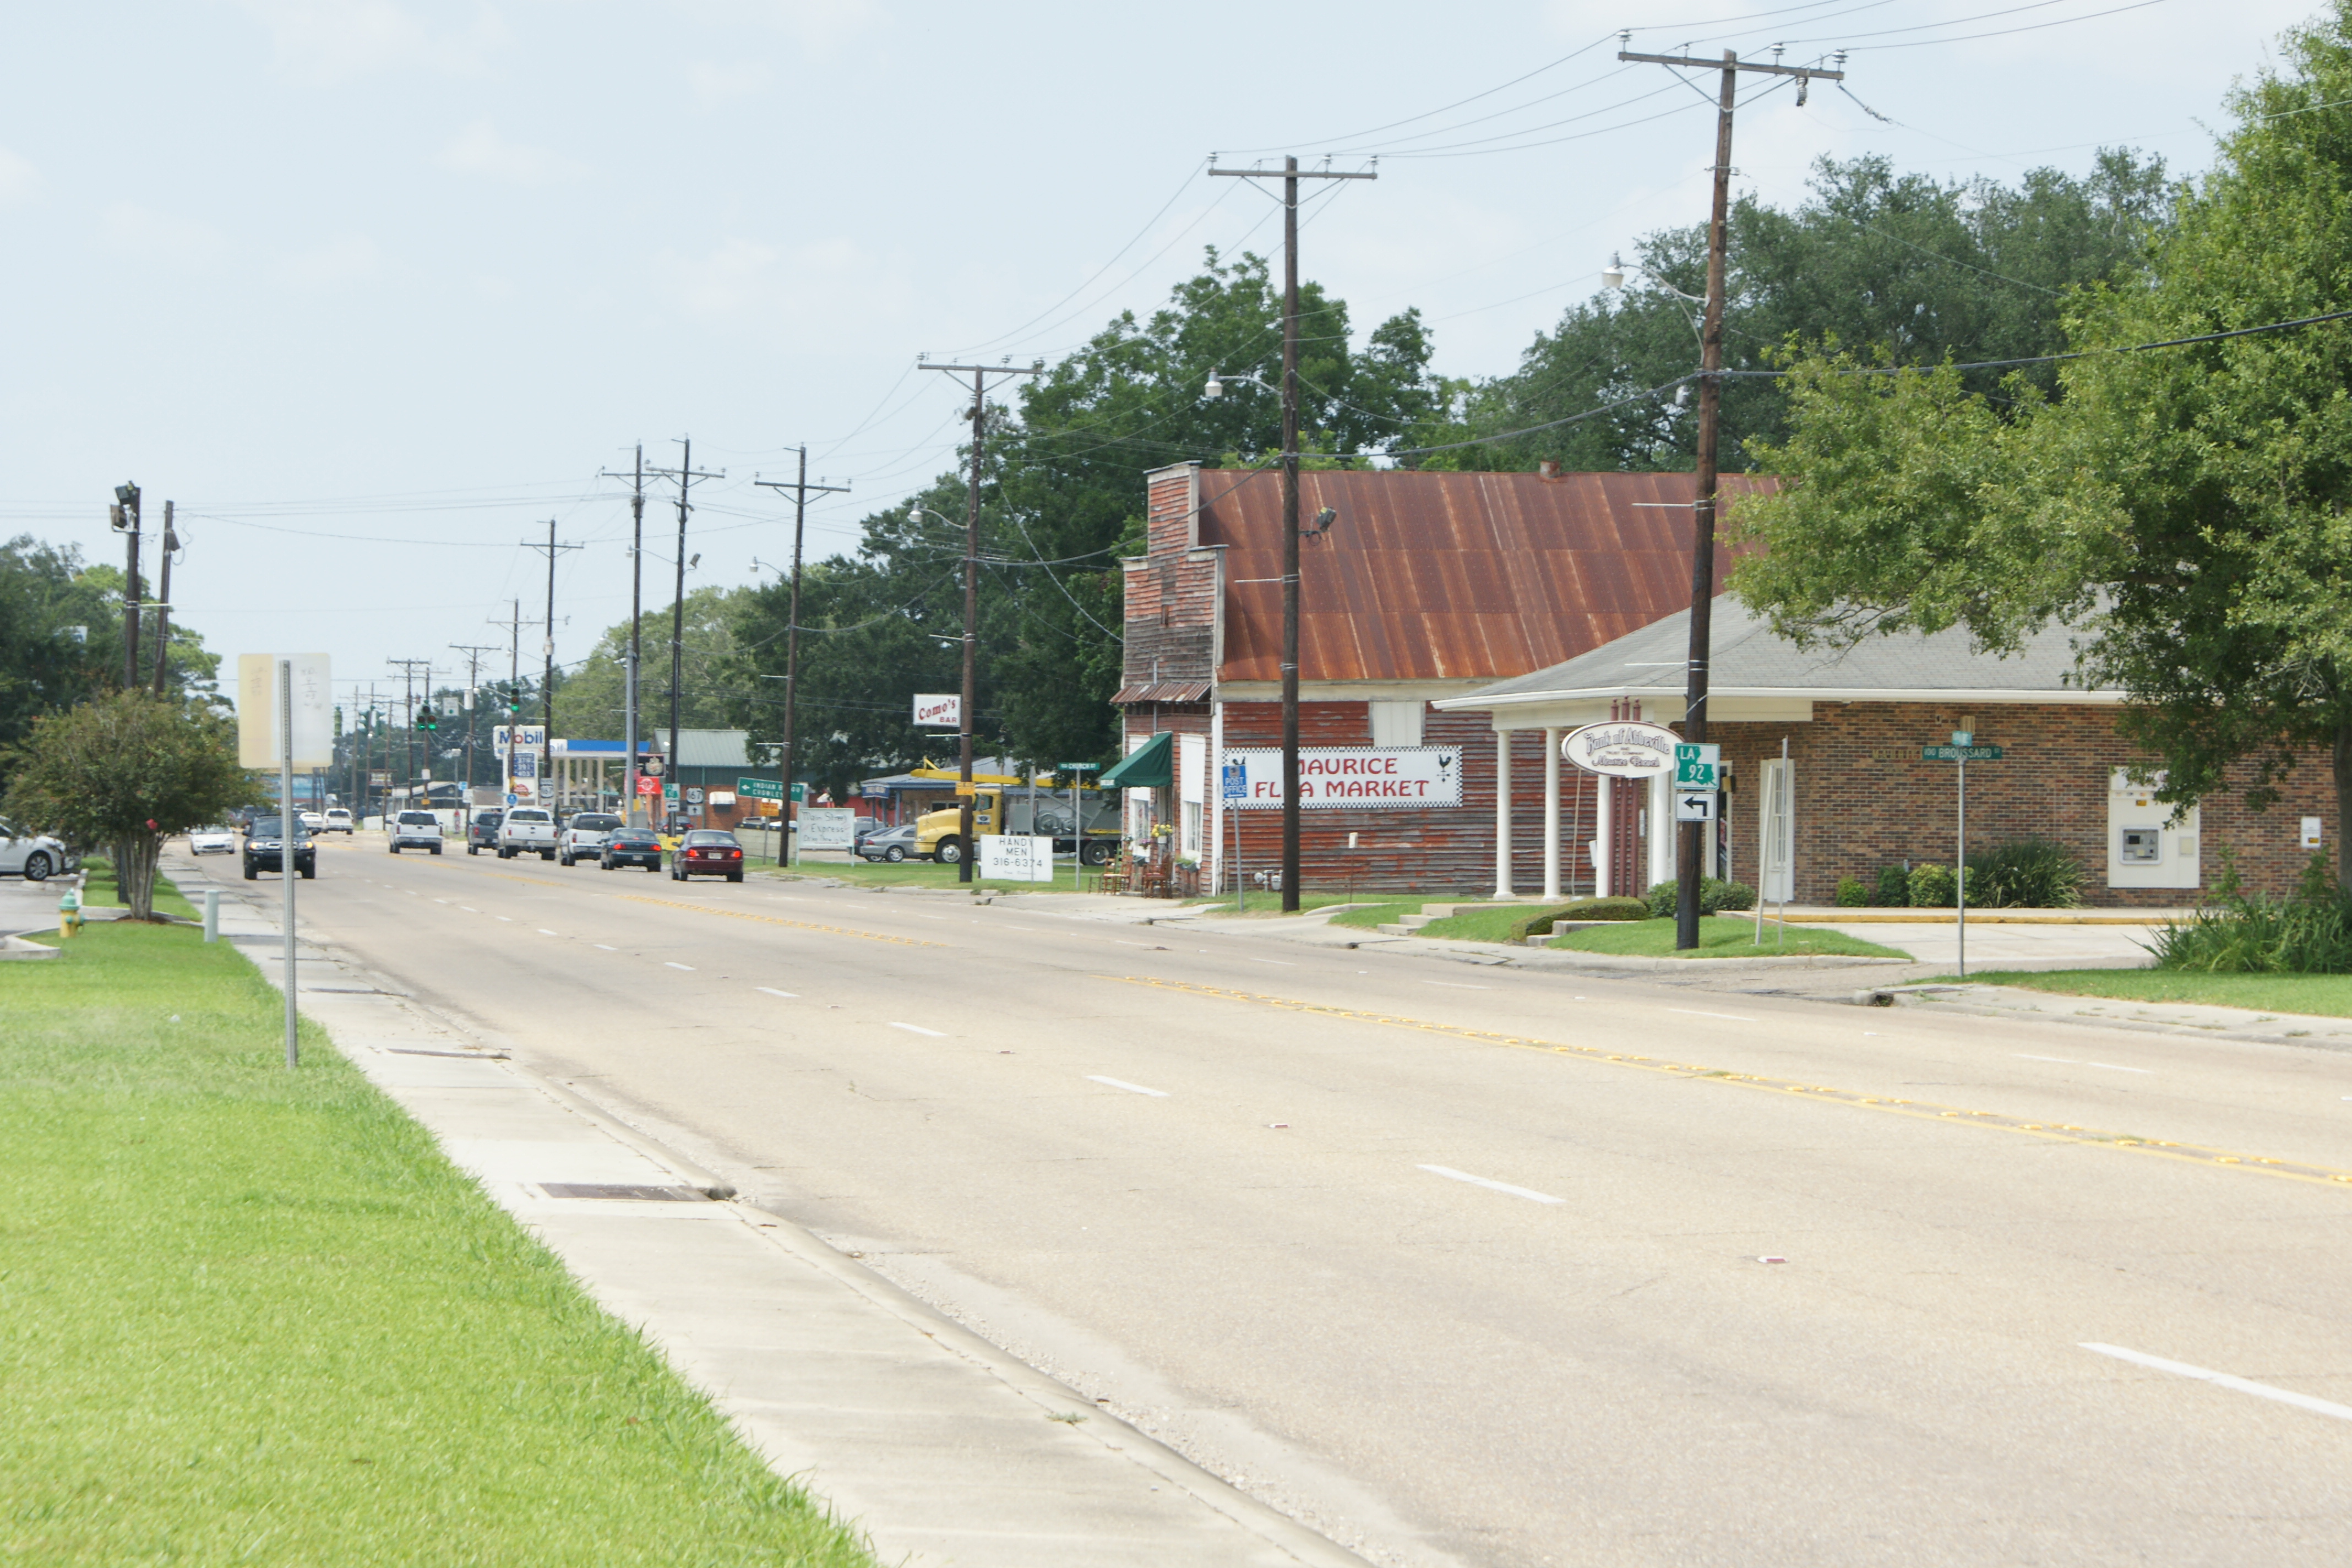 Maurice (Louisiana)